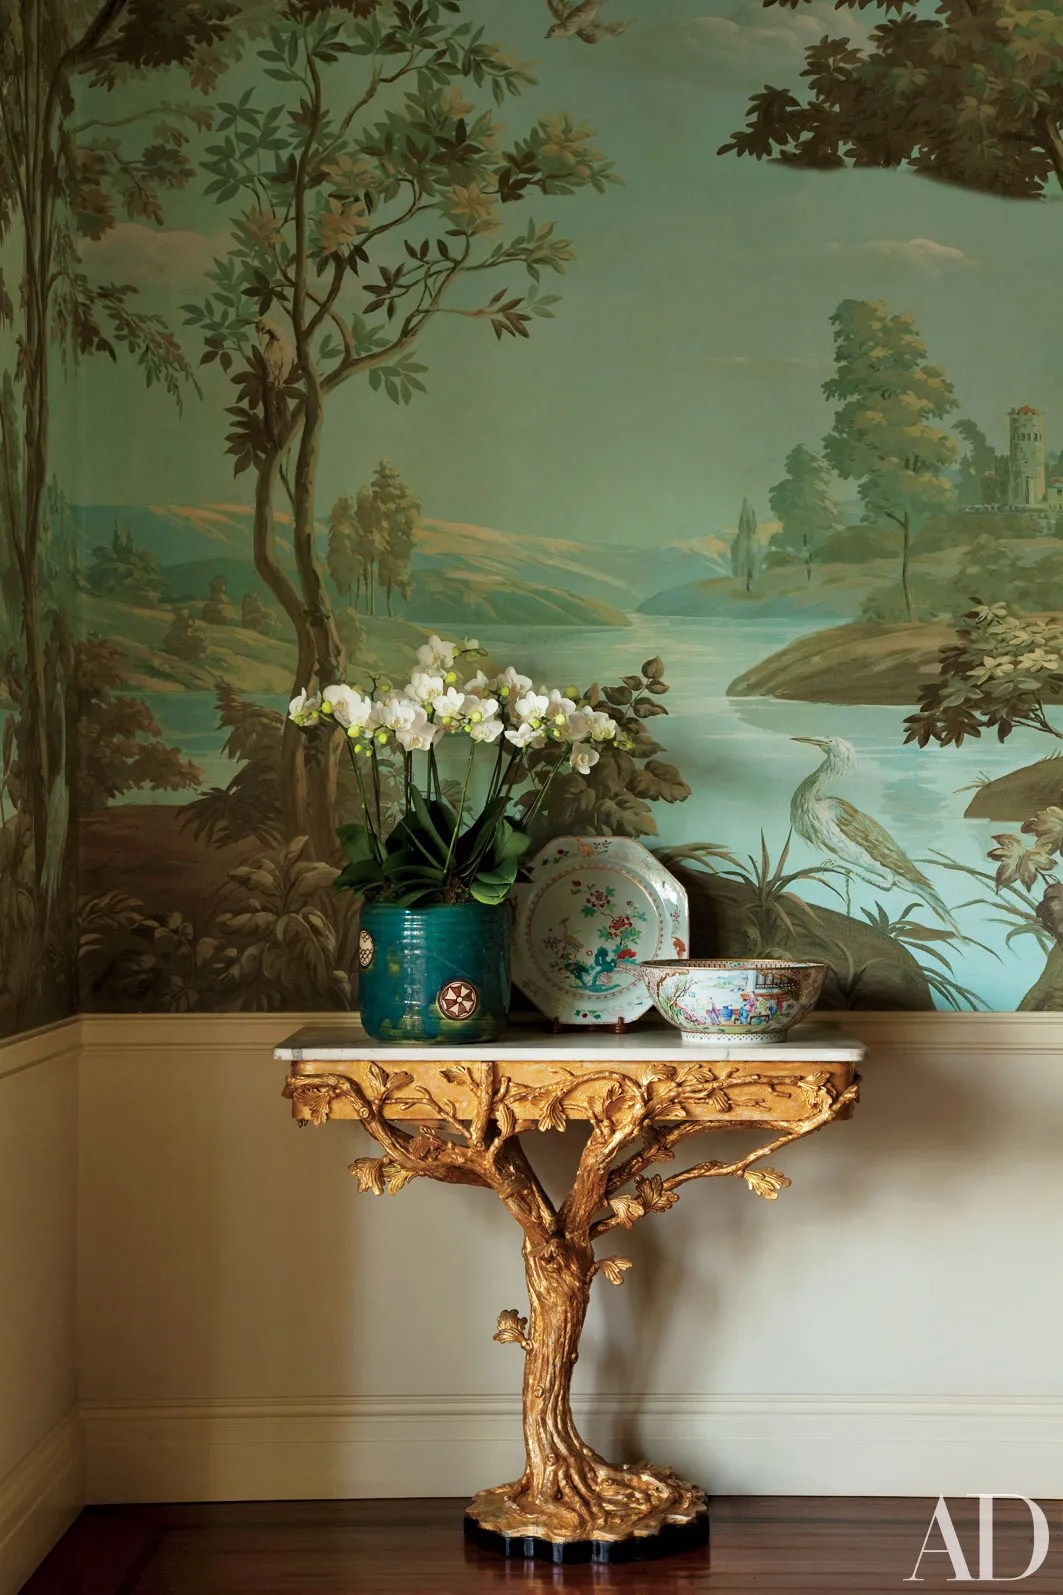 Floral Wallpaper Decorating Inspiration Photos